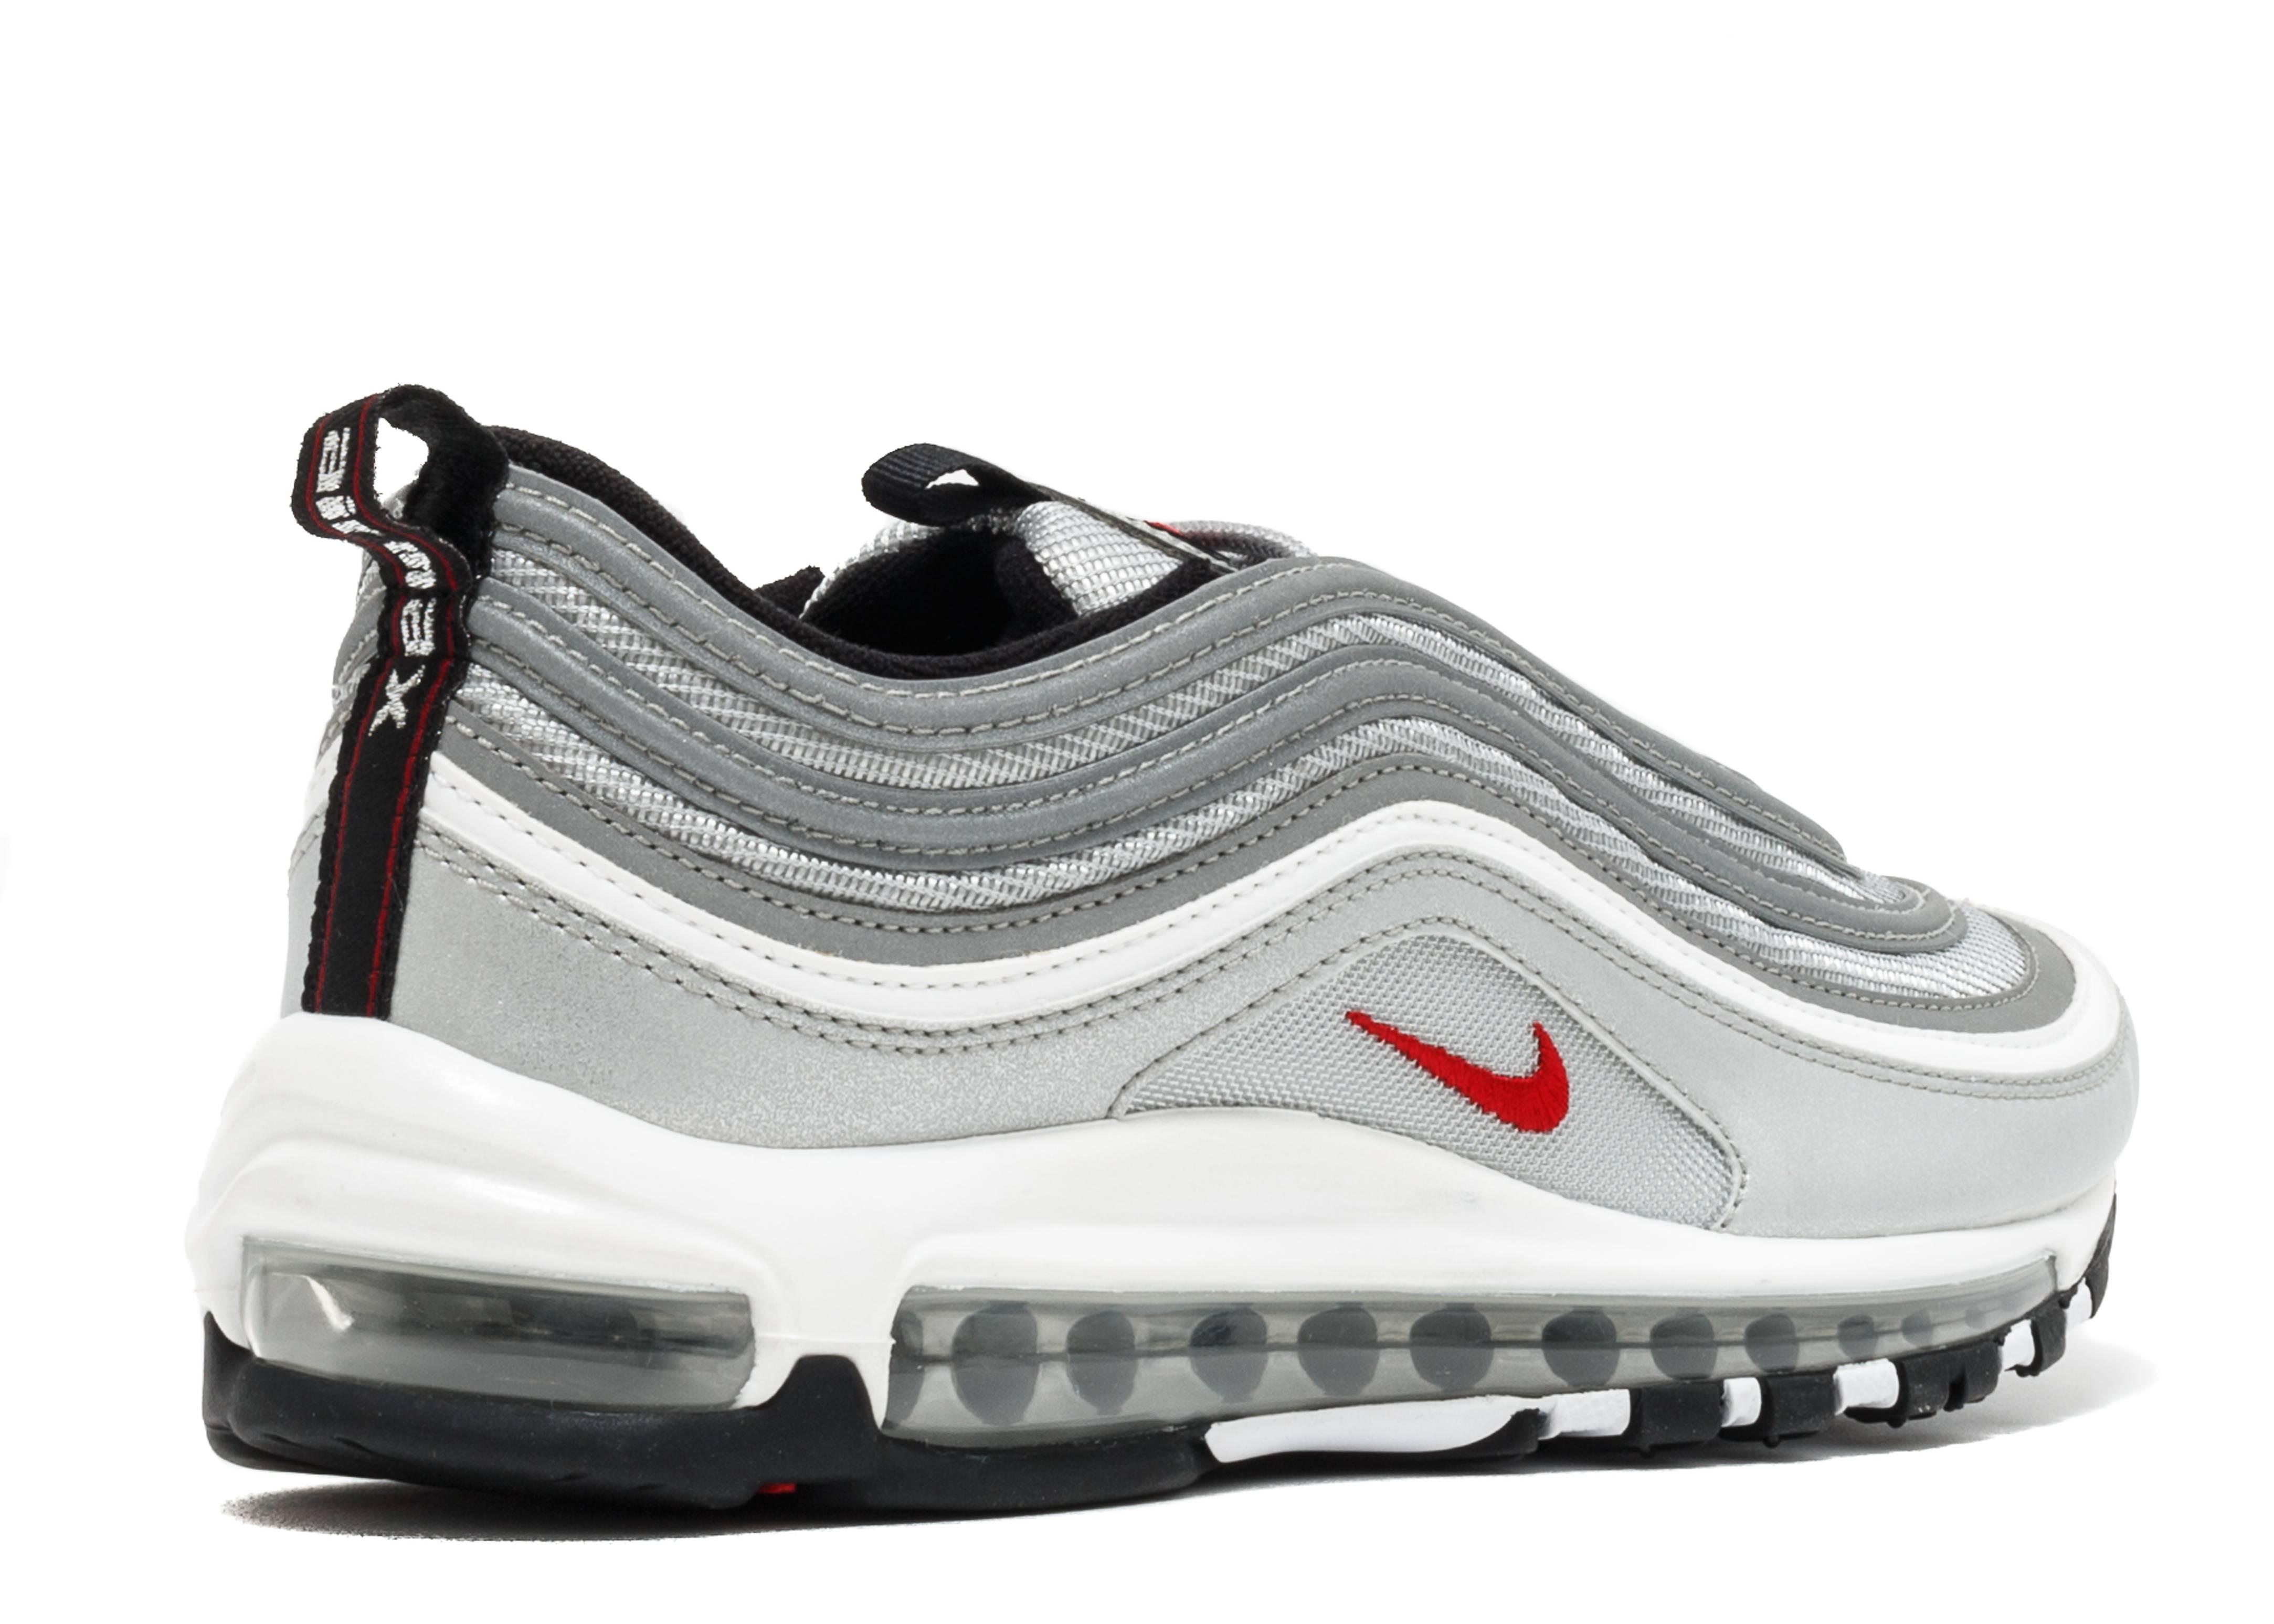 Nike Air Max 97 OG QS 'Silver Bullet' Metallic SilverVarsity Red 884421 001